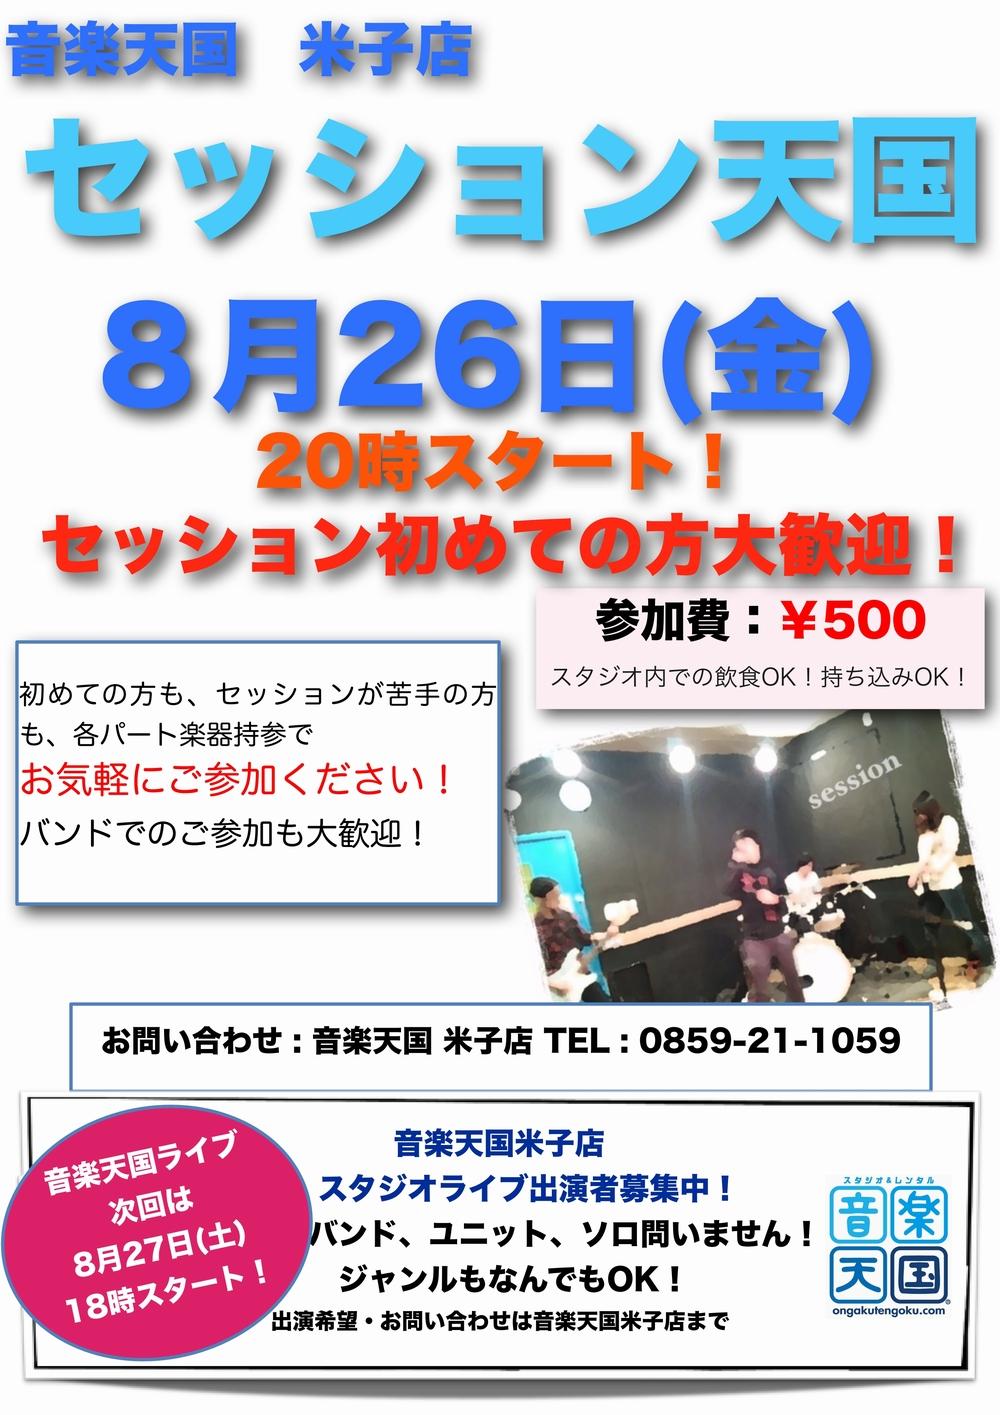 【セッション天国】音楽天国・米子FS店8月26日(金)開催